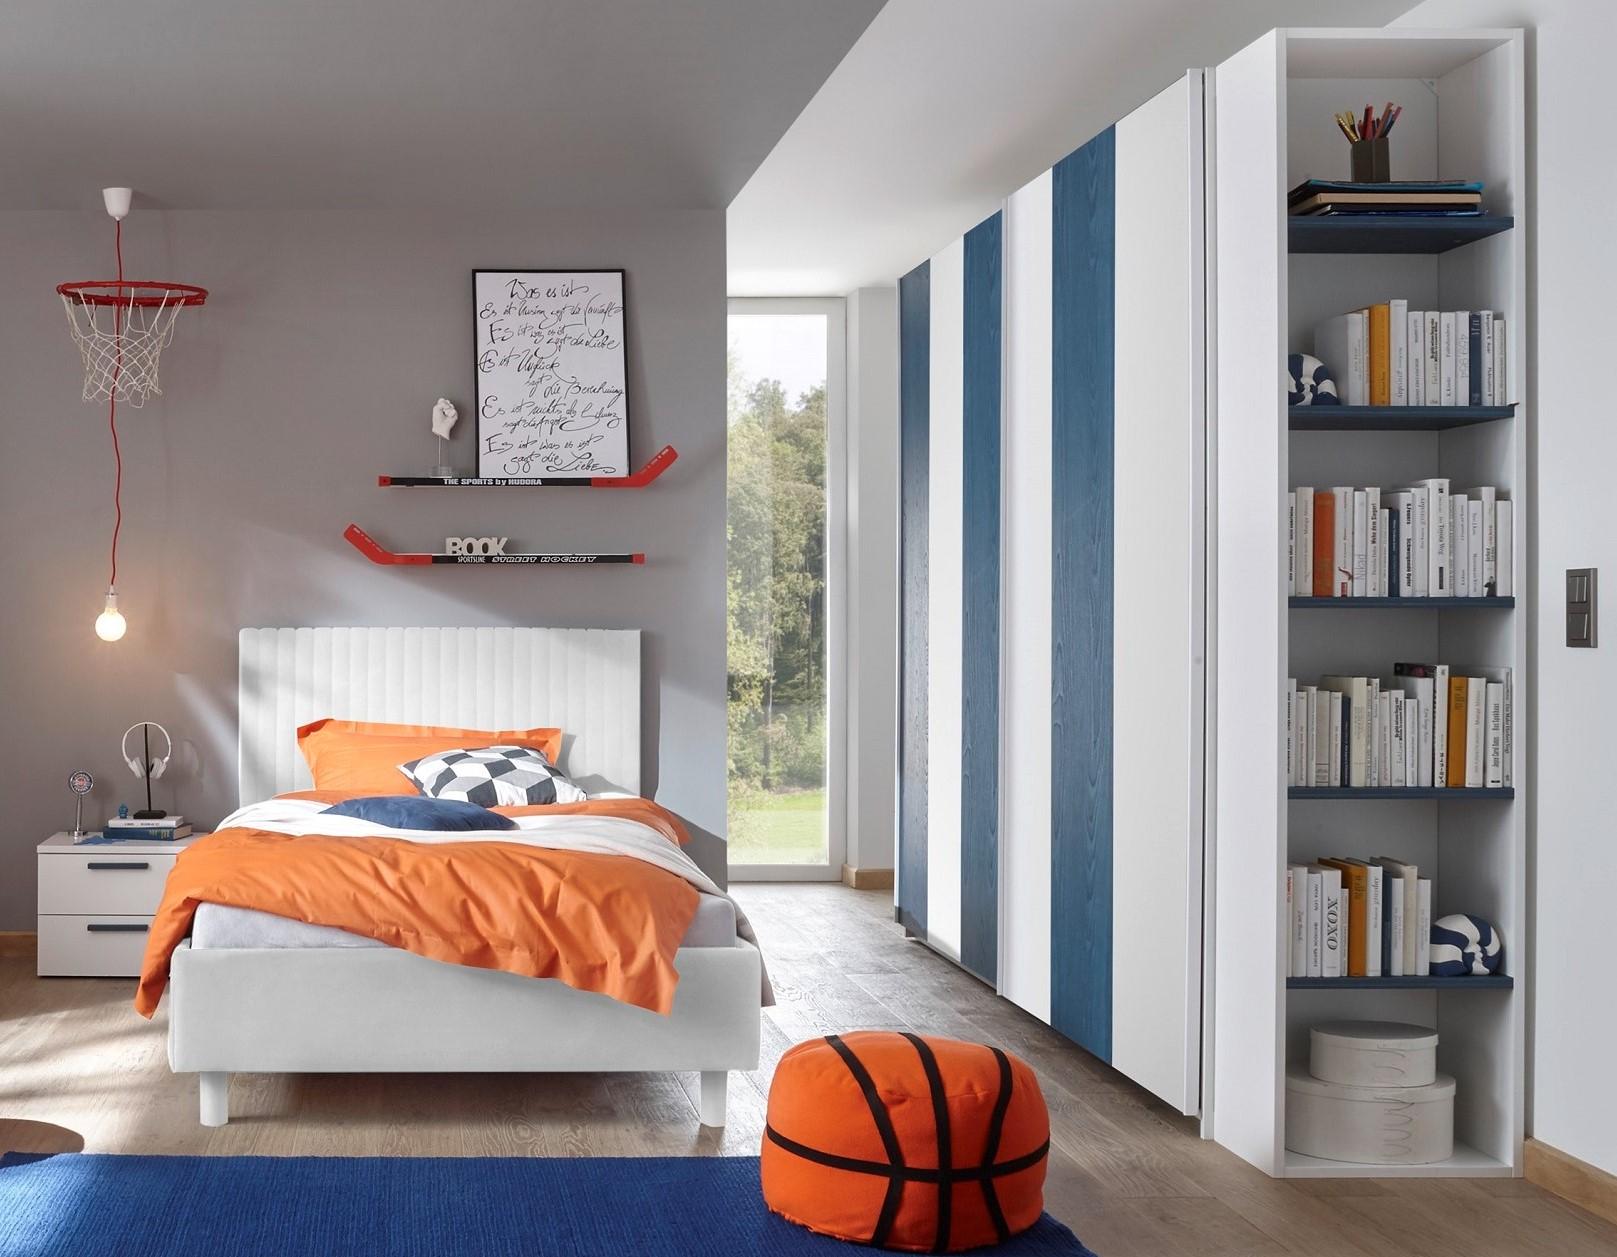 Schlafzimmer Freli Weiss Blau Inkl Regal Lc Mobili Mobel Zeit